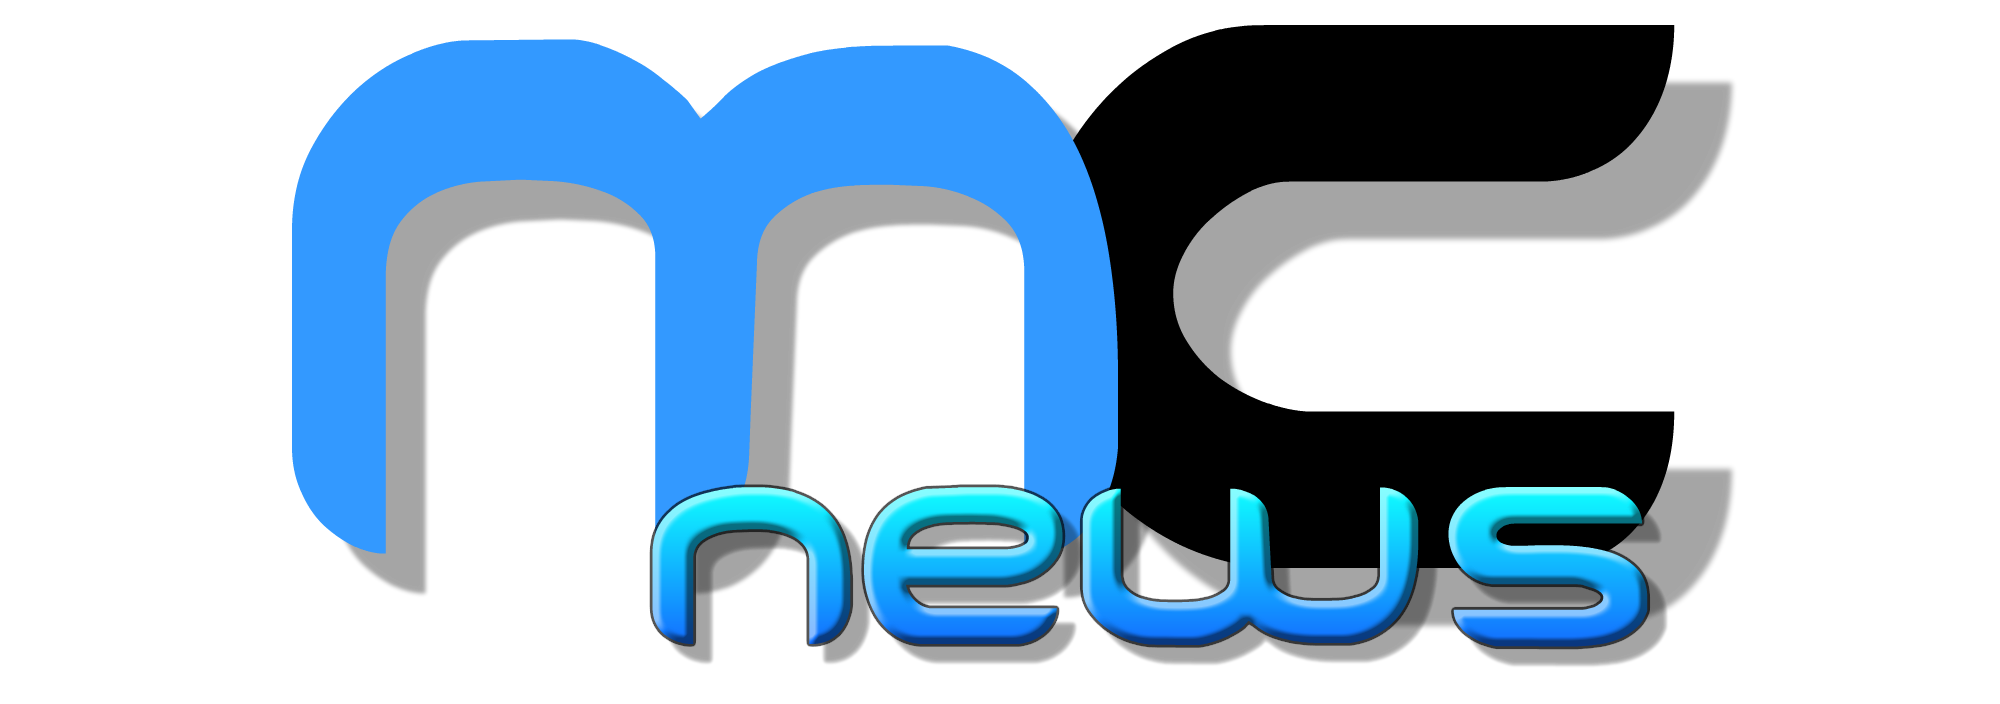 MCNews.it